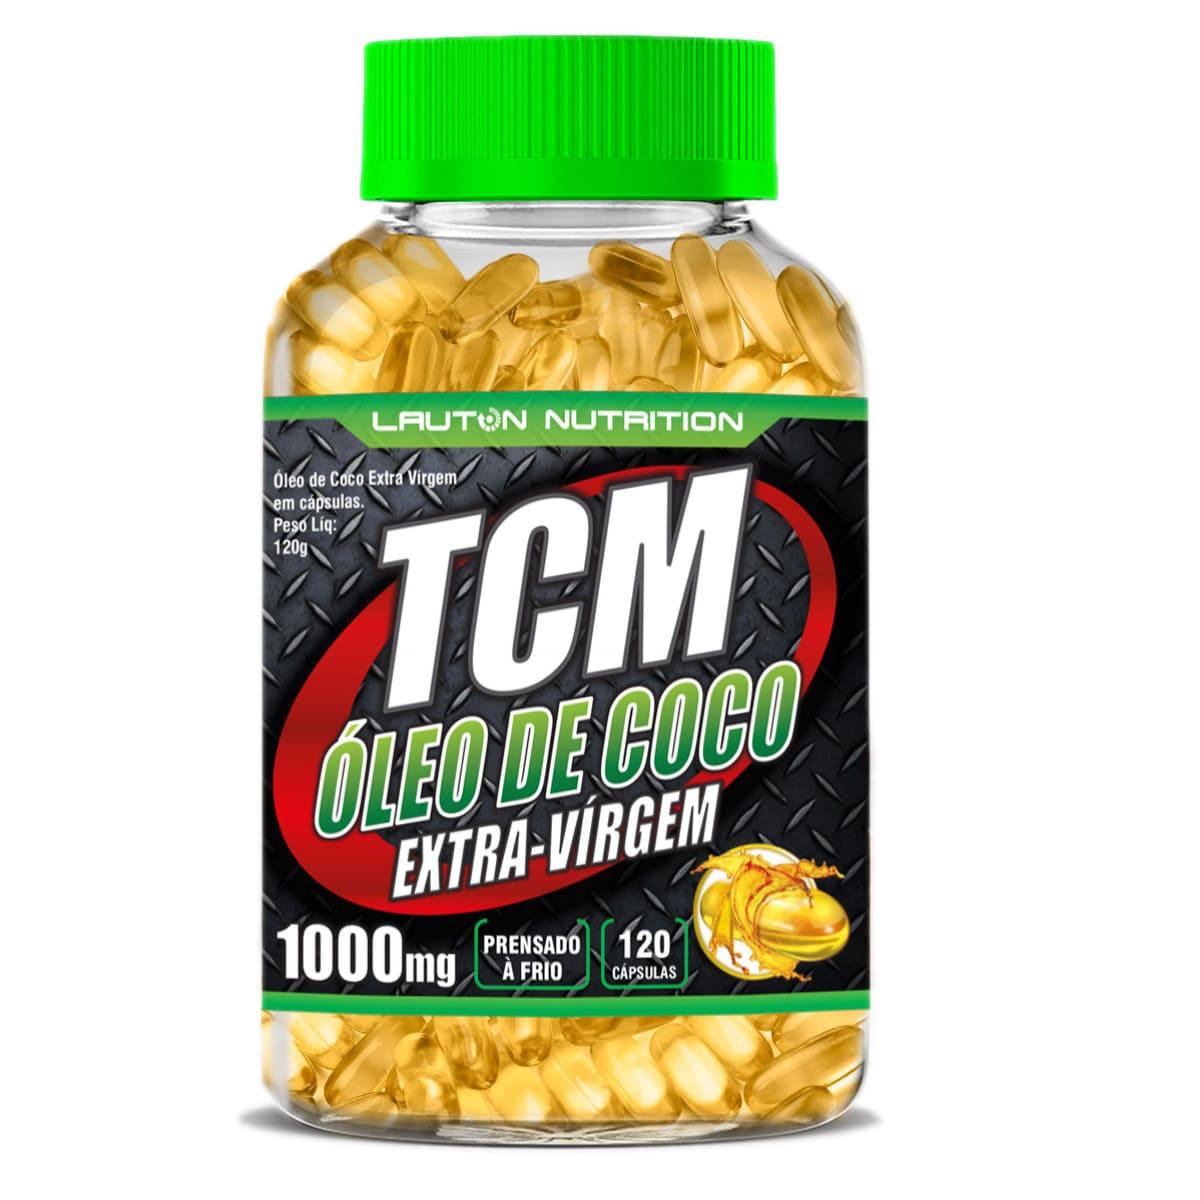 TCM Óleo De Coco Extra Virgem - MCT 120 Cáps 1000mg - Lauton Nutrition